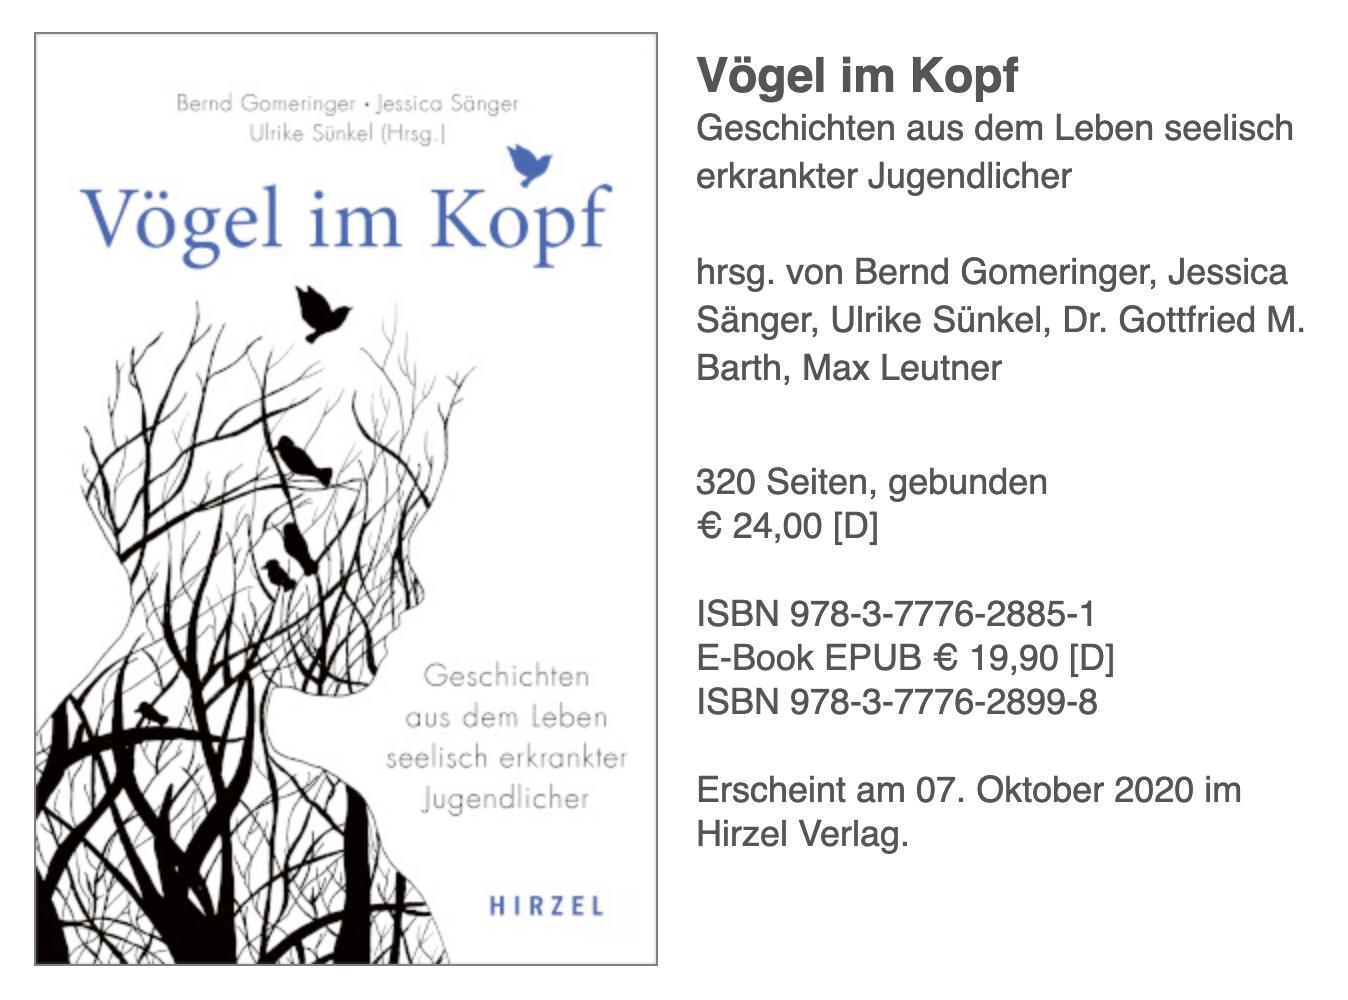 Hirzel Verlag